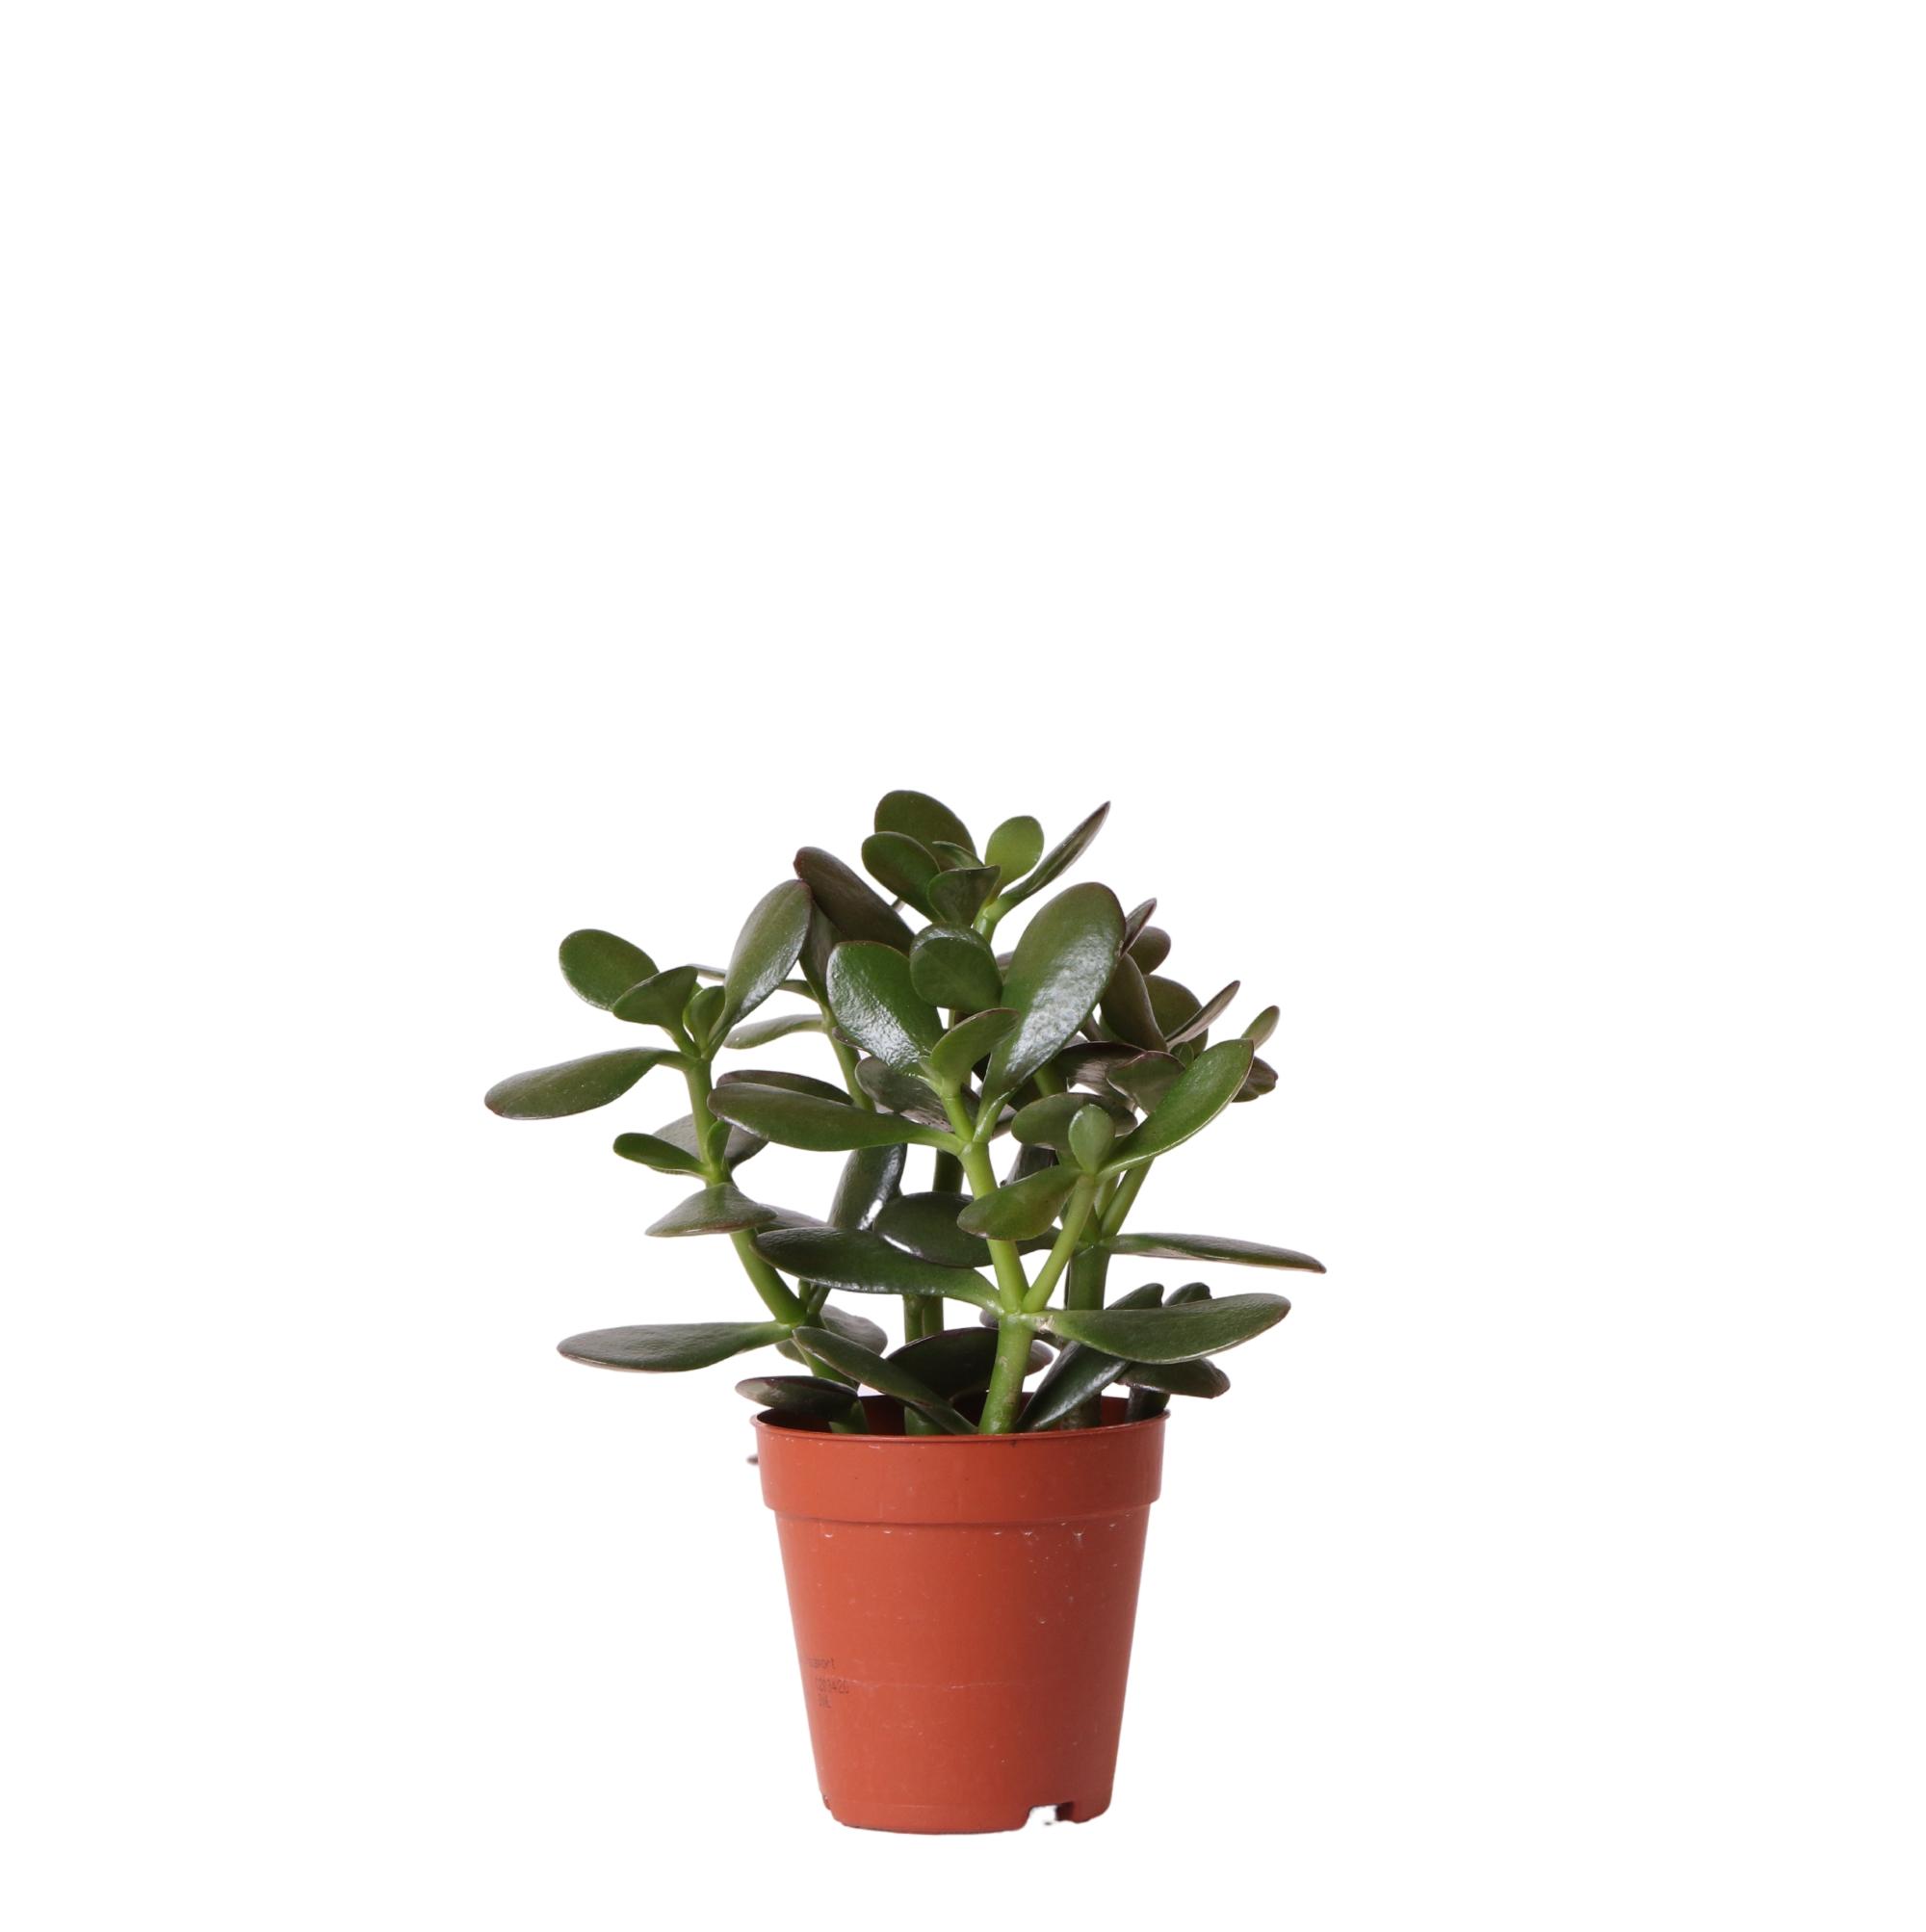 Kolibri Greens Succulents Crassula ovata 9cm